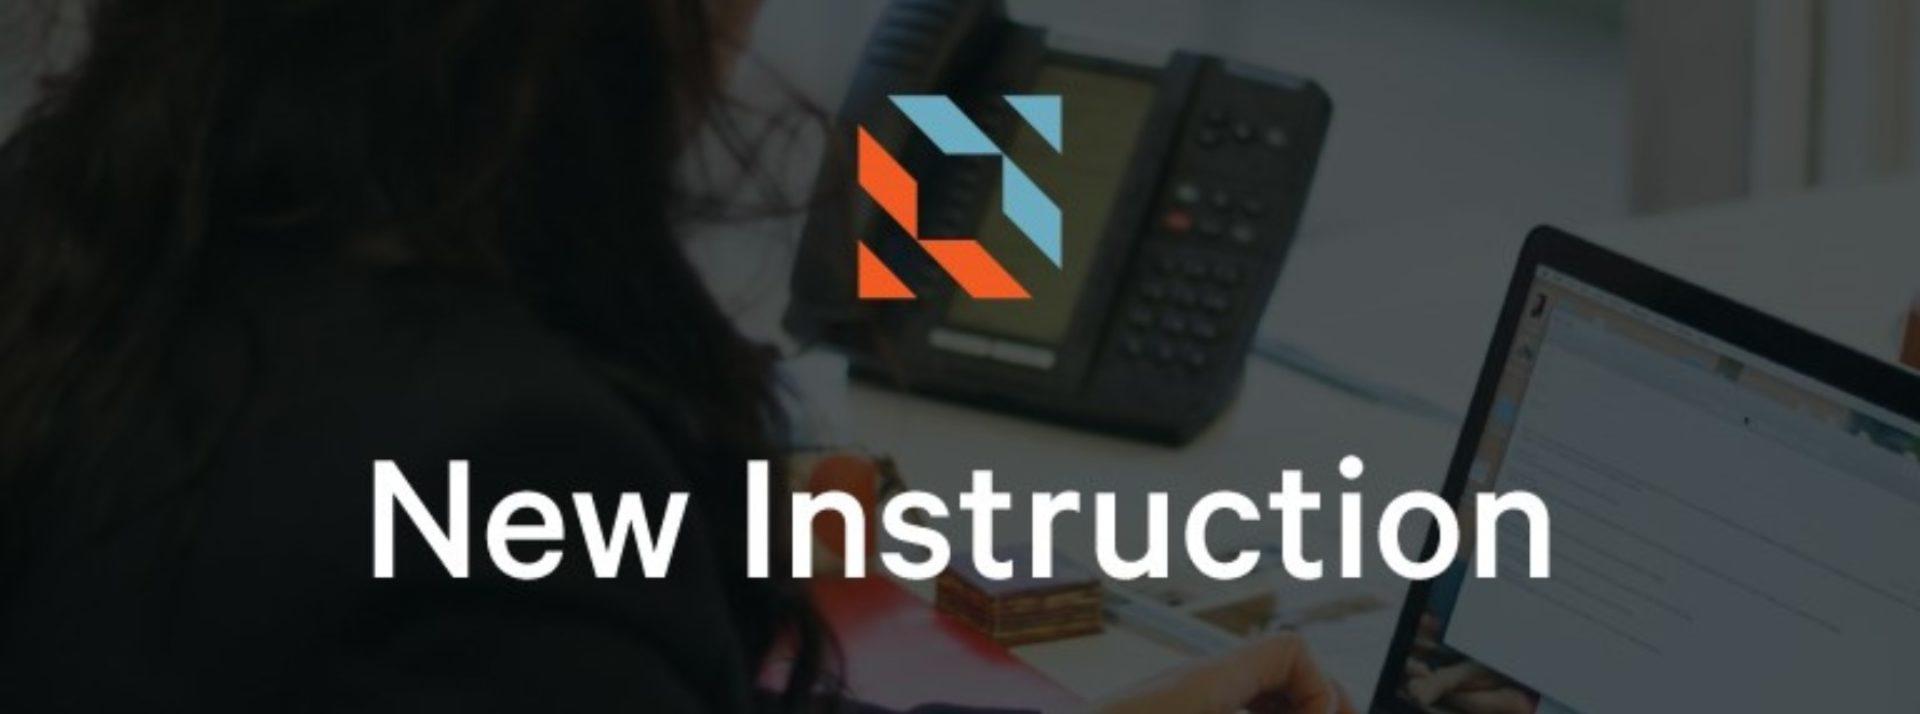 New Instruction